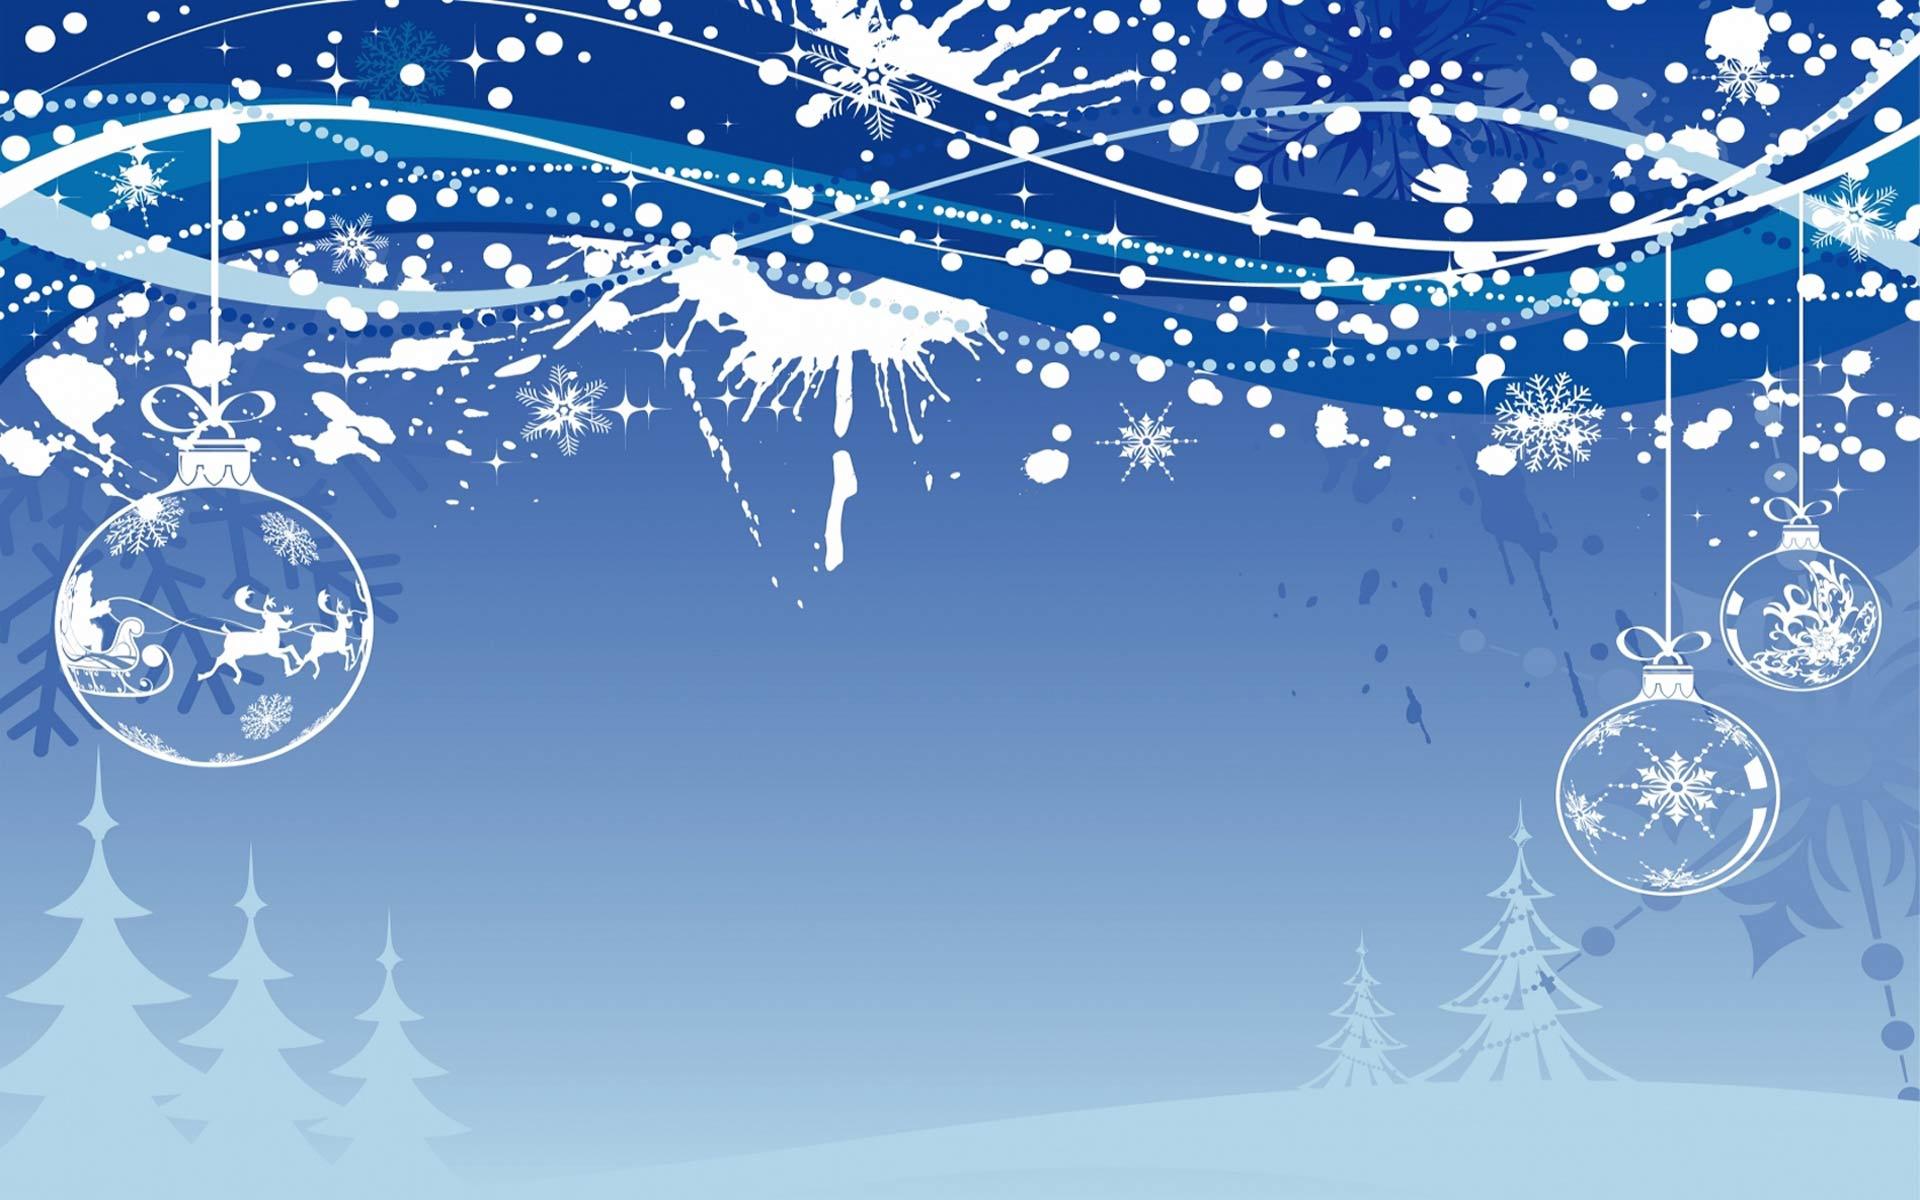 live christmas wallpaper for desktop   wwwwallpapers in hdcom 1920x1200